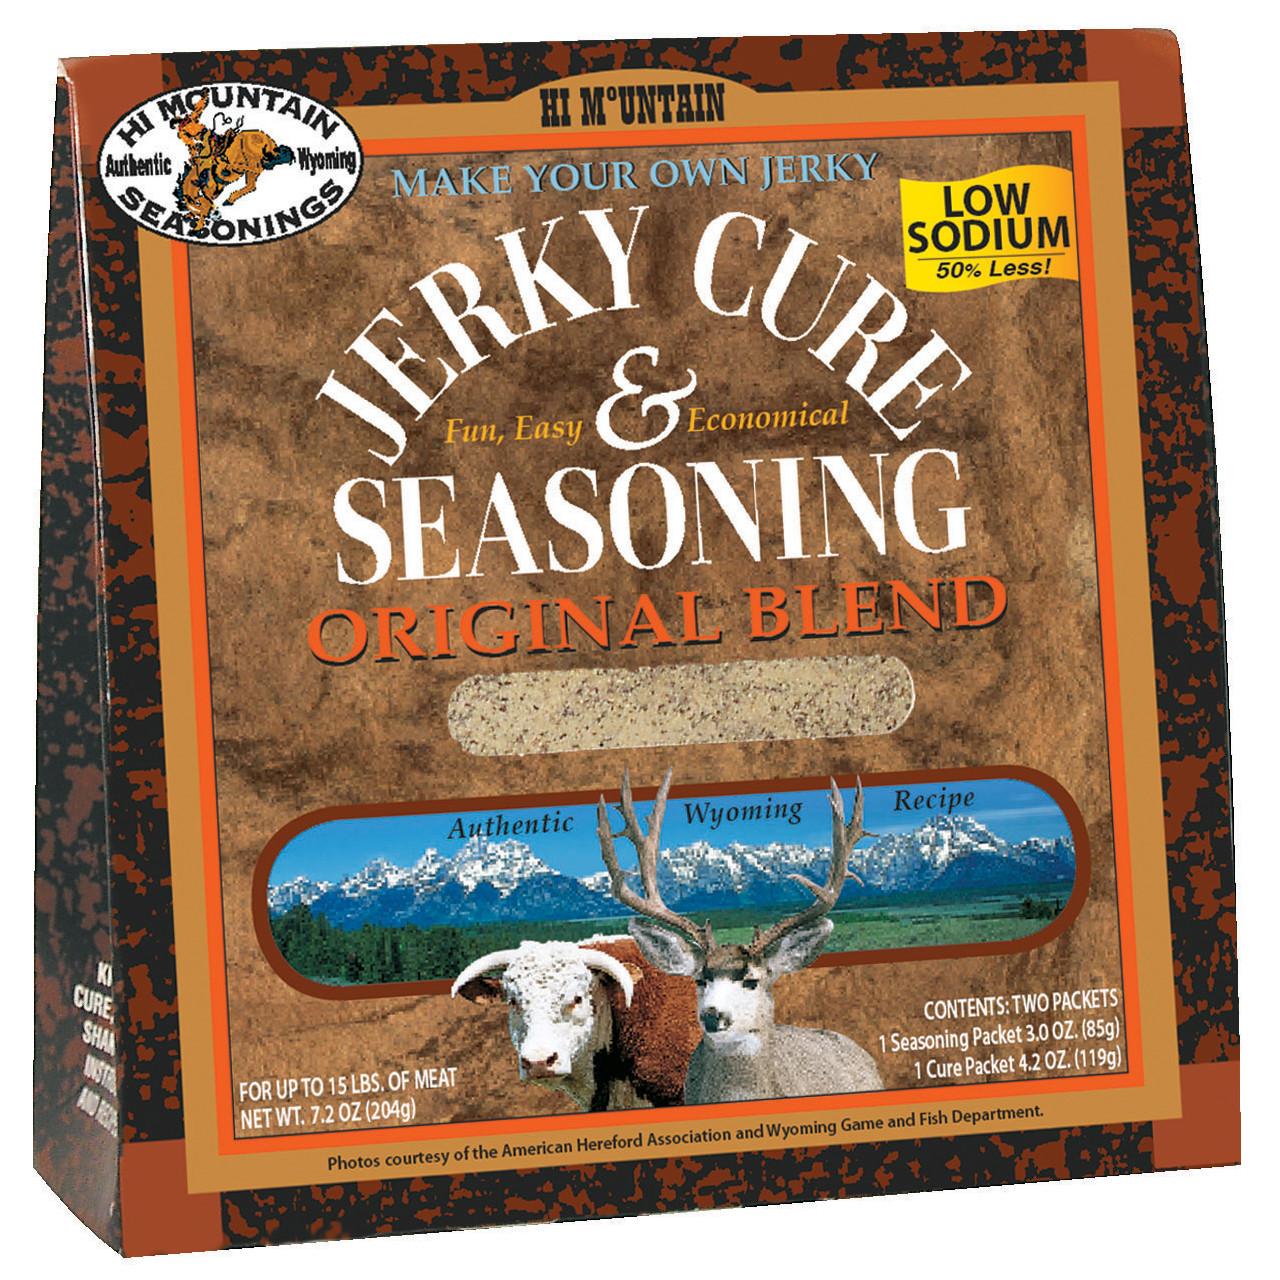 Original Blend Low Sodium Jerky Kit